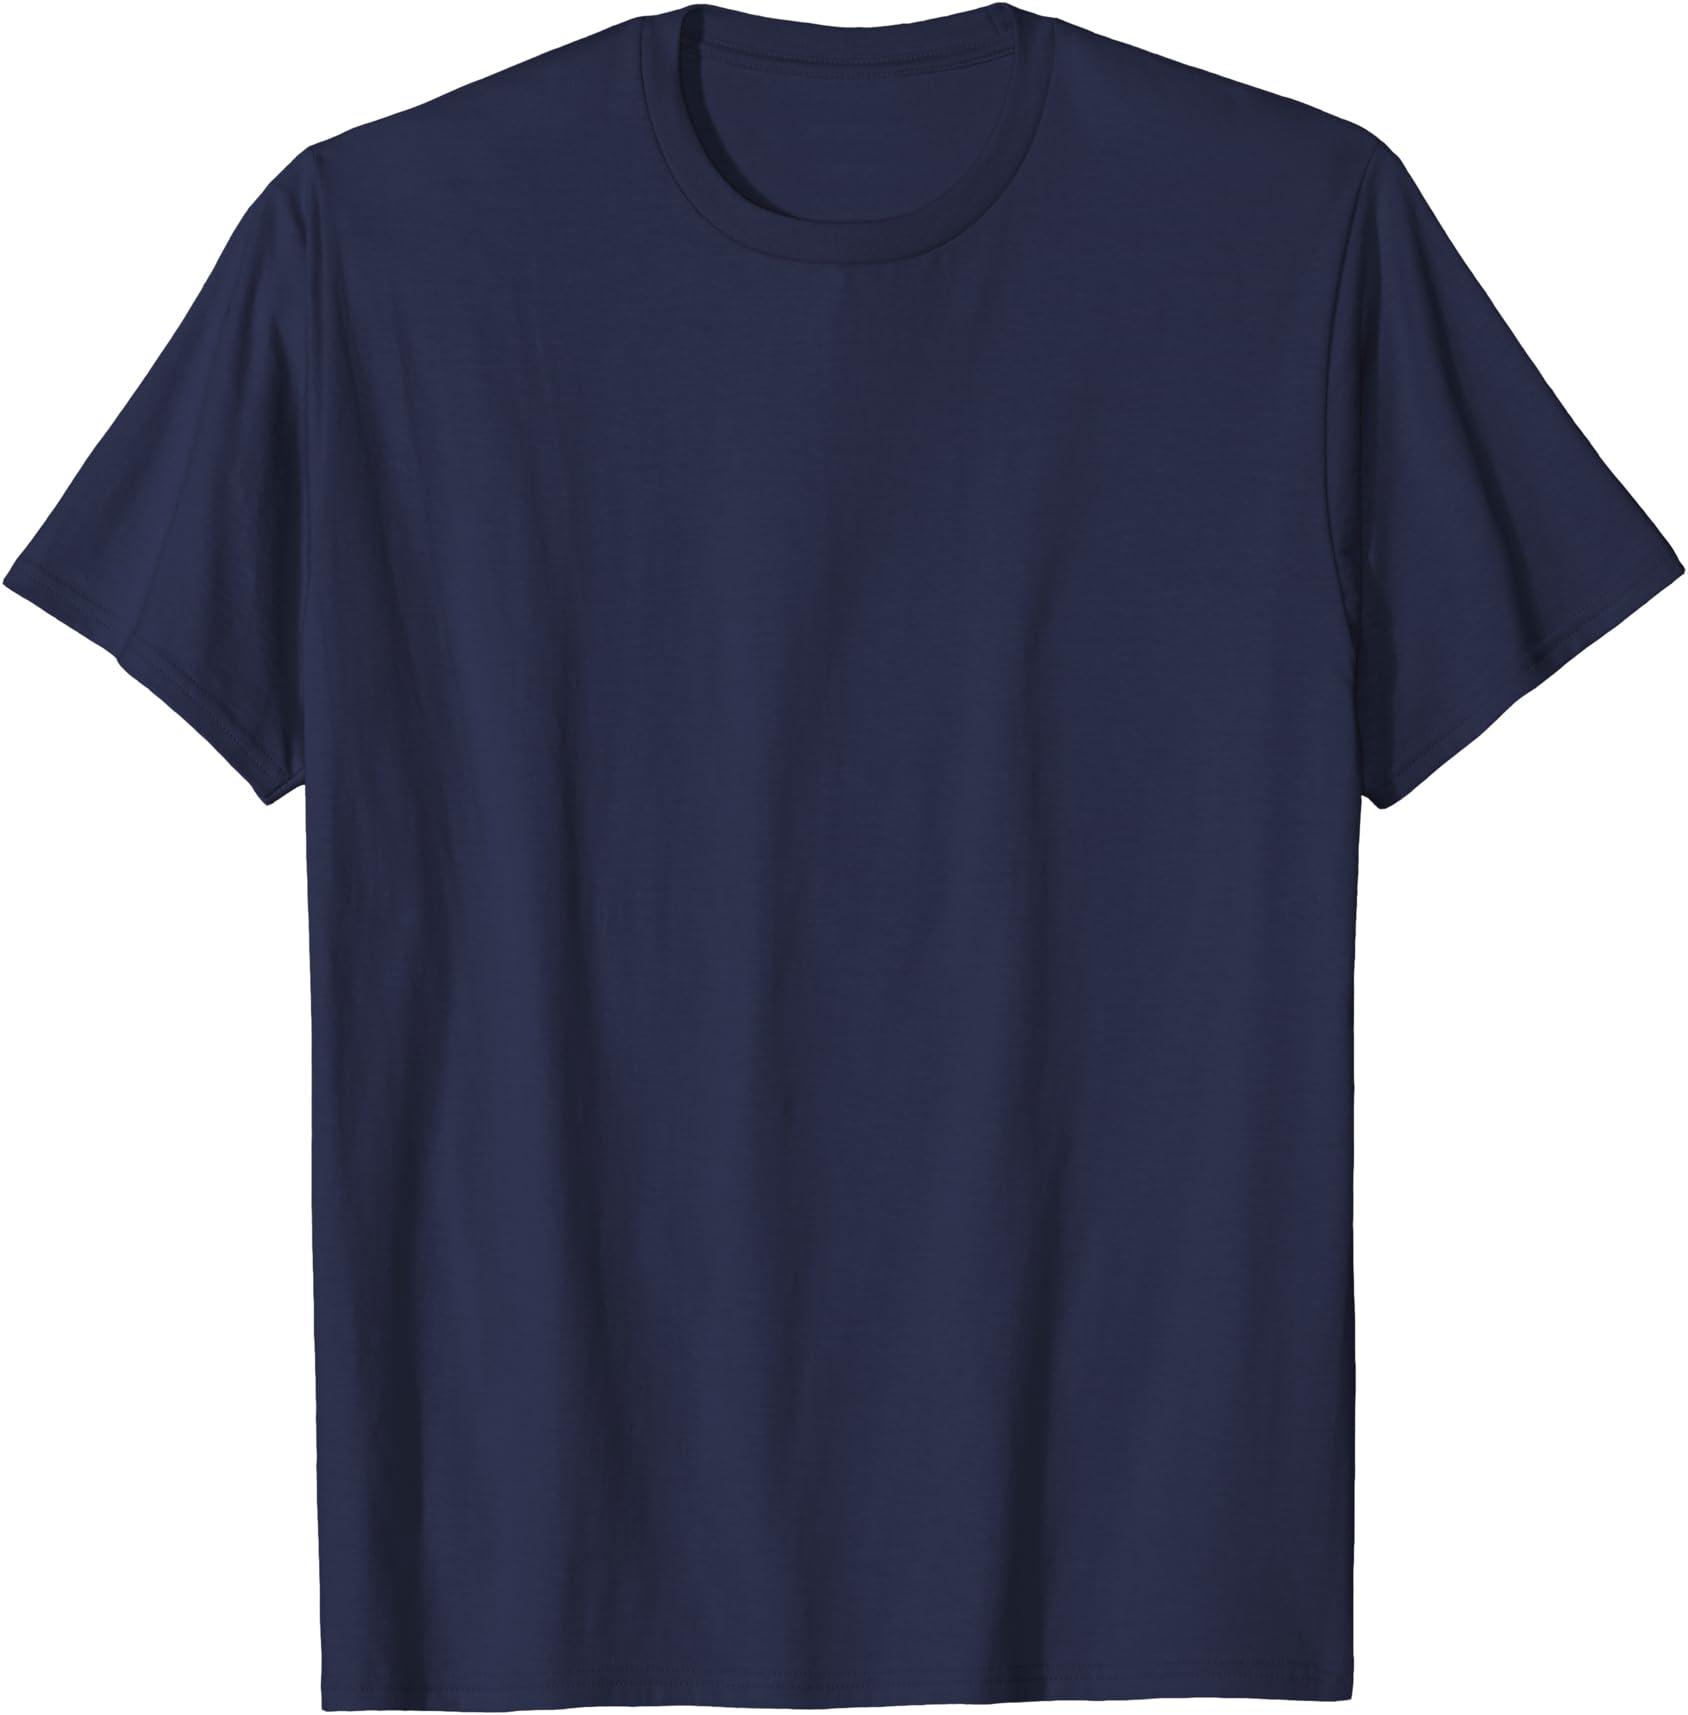 Eat Sleep Climb Repeat Kid/'s T-Shirt Children Boys Girls Unisex Top Climbing